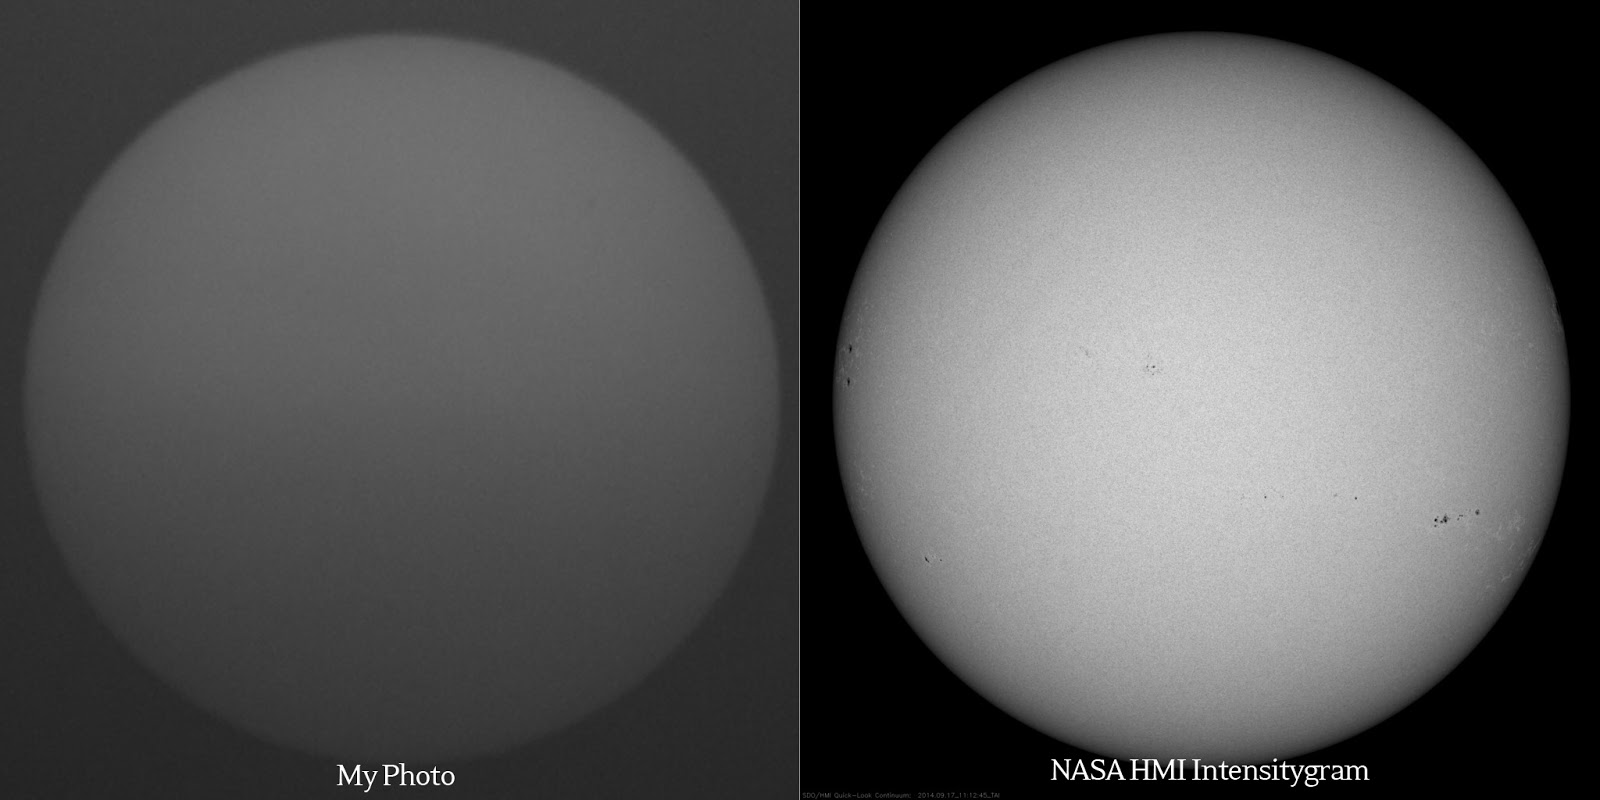 sun compare to HMI